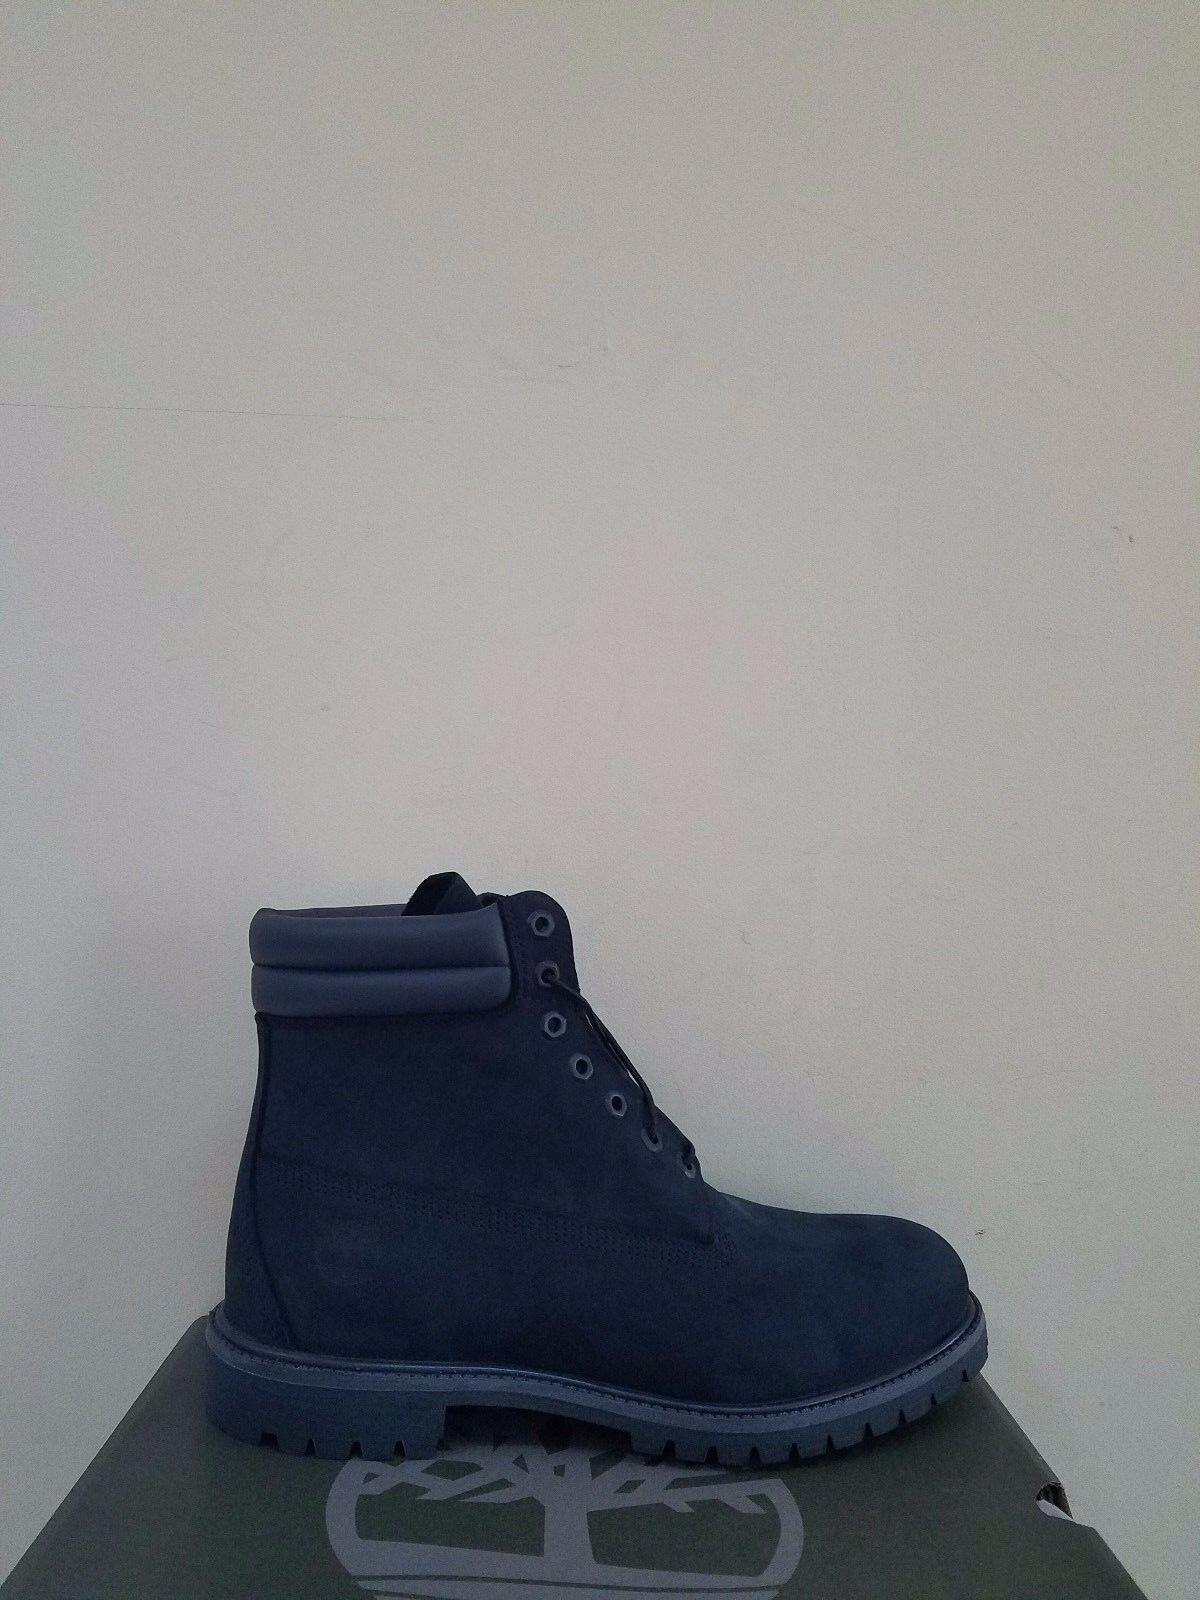 Timberland Men's 6-Inch Premium  Waterproof Navy Boots NIB